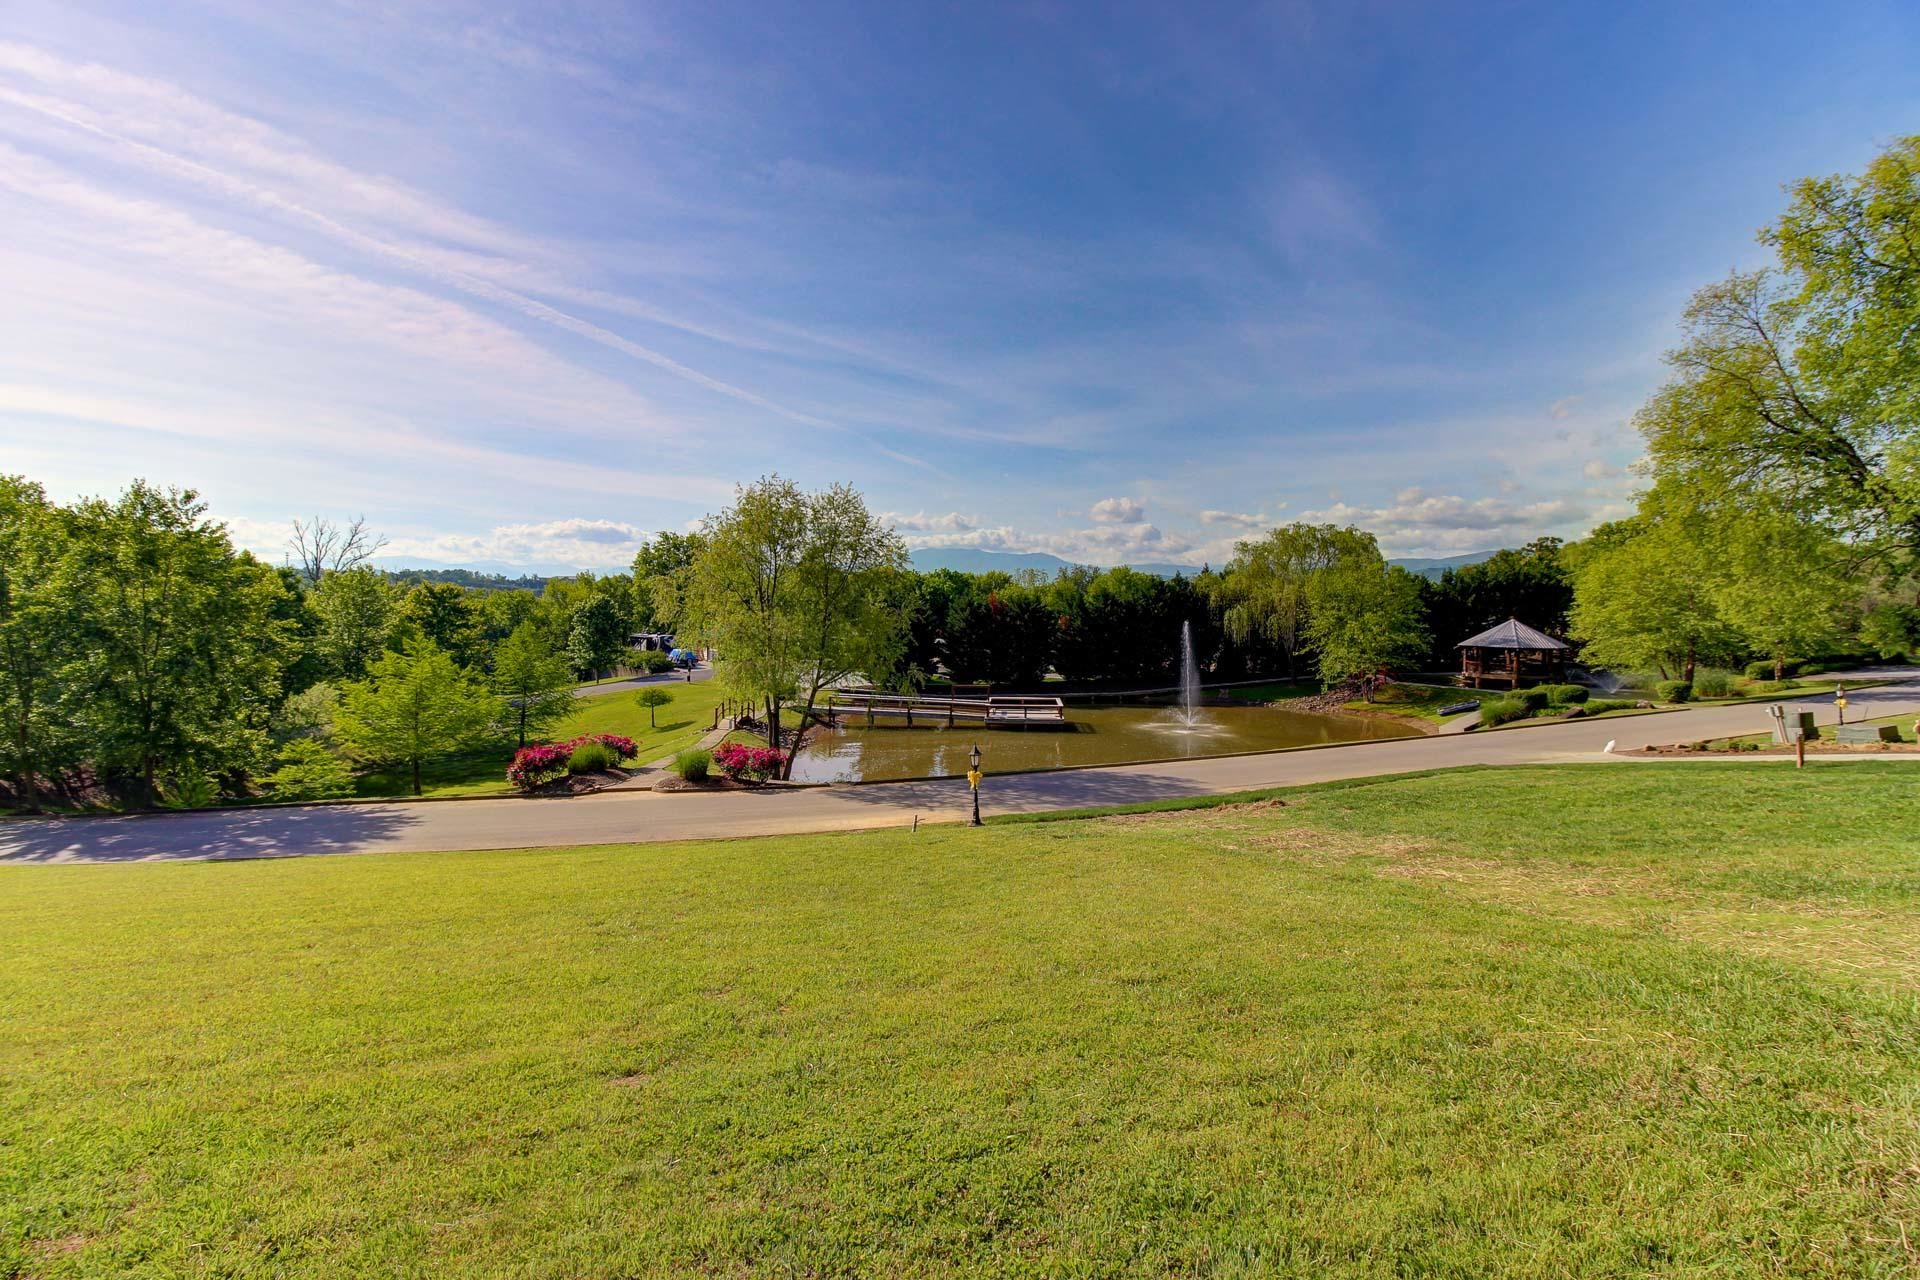 Photo of Lot 194R Wilderness Path Way, Sevierville, TN 37876 (MLS # 1140329)